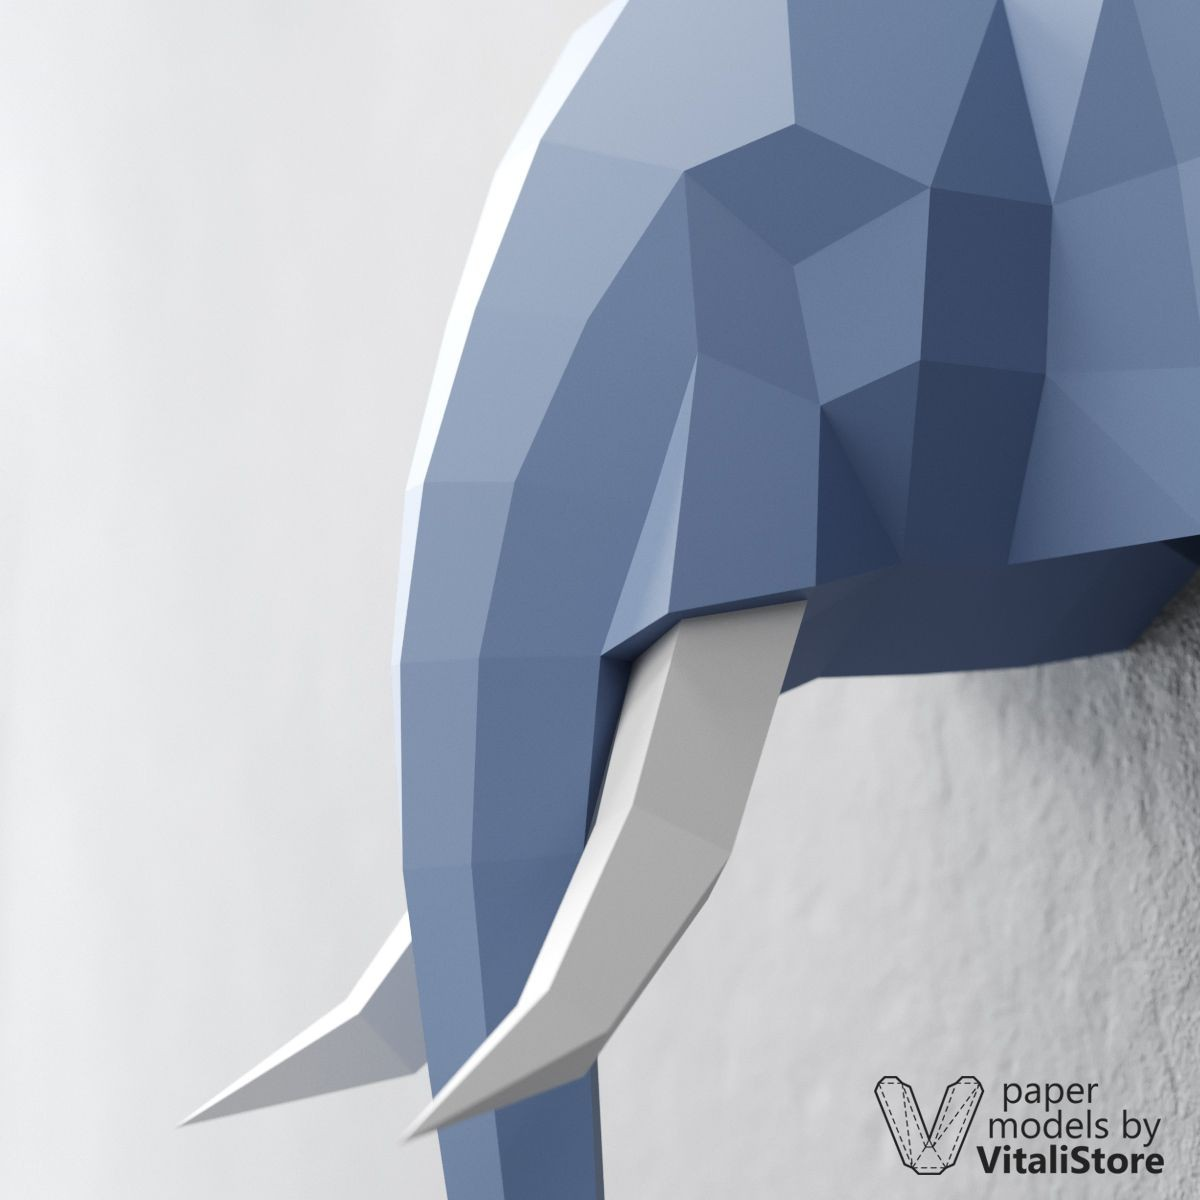 Papercraft Elephant Elephant Papercraft Diy Paper Sculpture Wall Decor